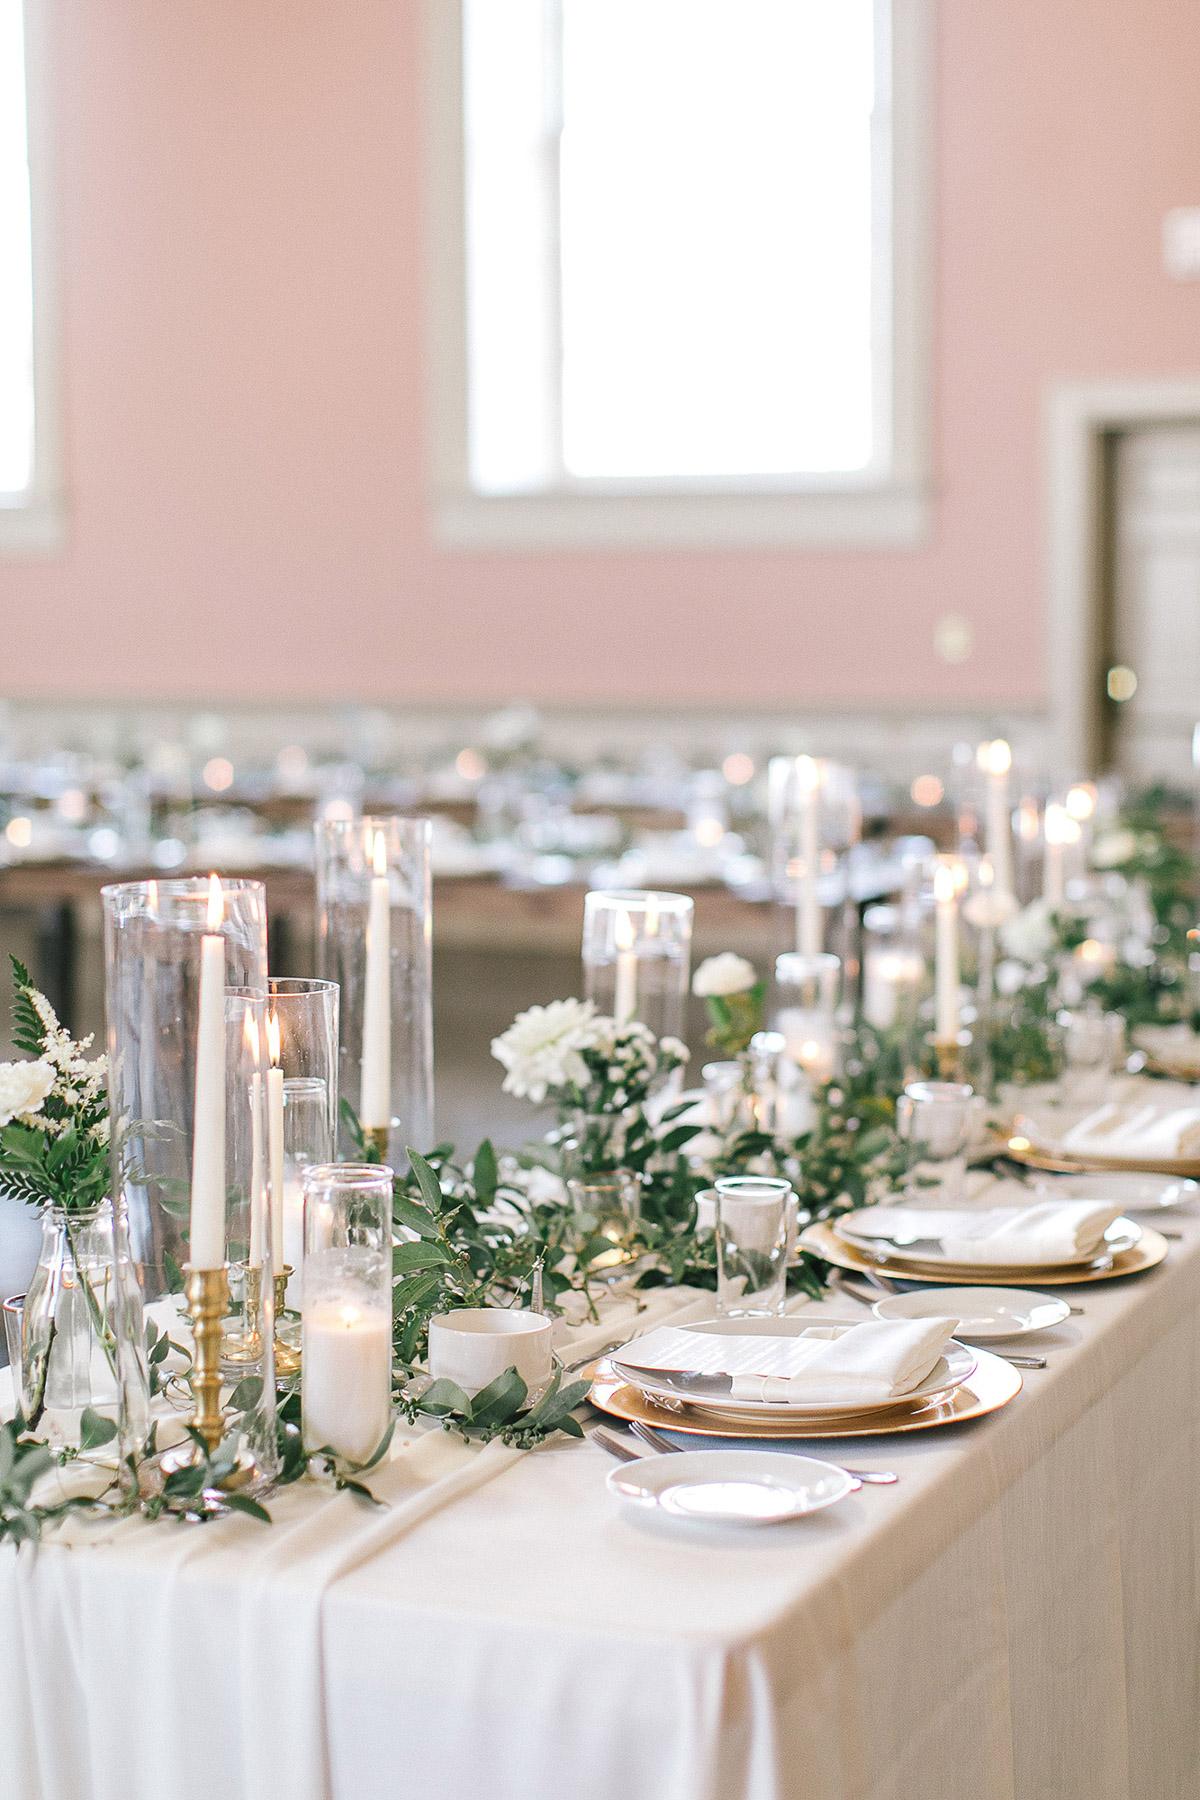 tamara-lockwood-photography-vineyard-bride-swish-list-the-old-courthouse-niagara-on-the-lake-wedding-64.jpg